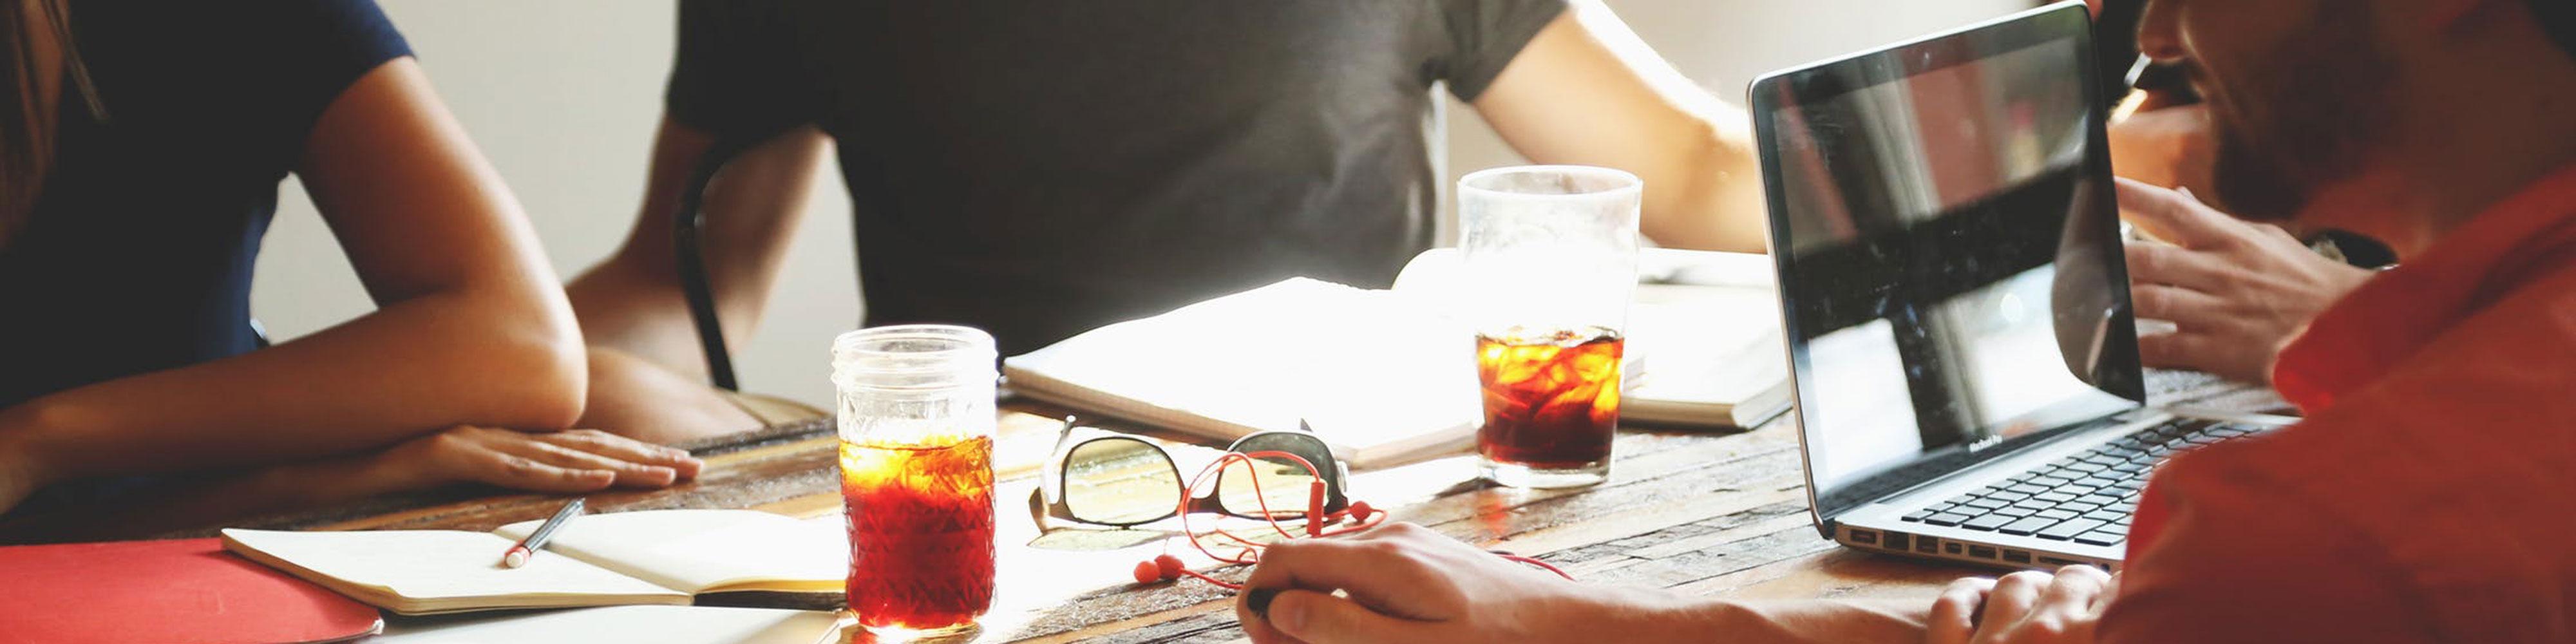 Expert Language Interpreters having meeting with tea and coffee